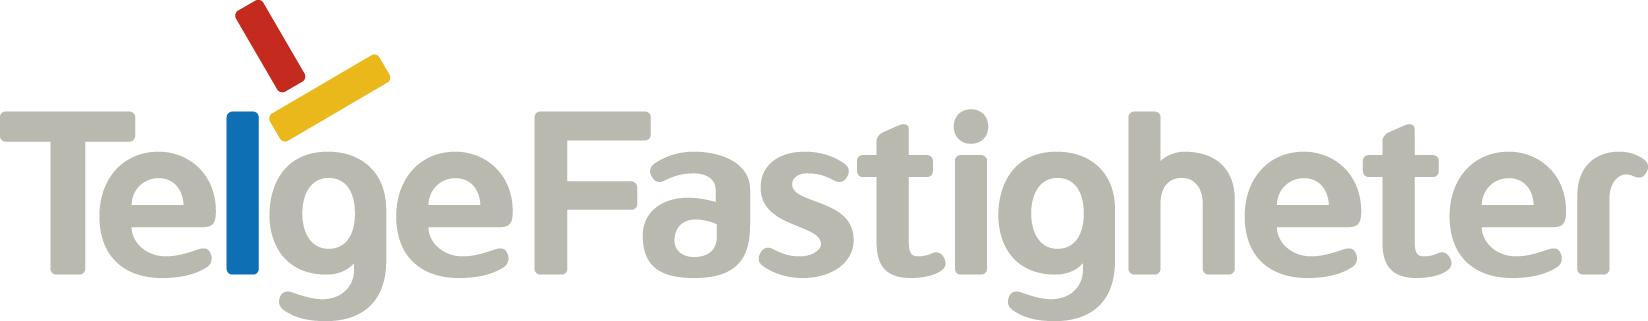 Telge Fastigheters logotyp